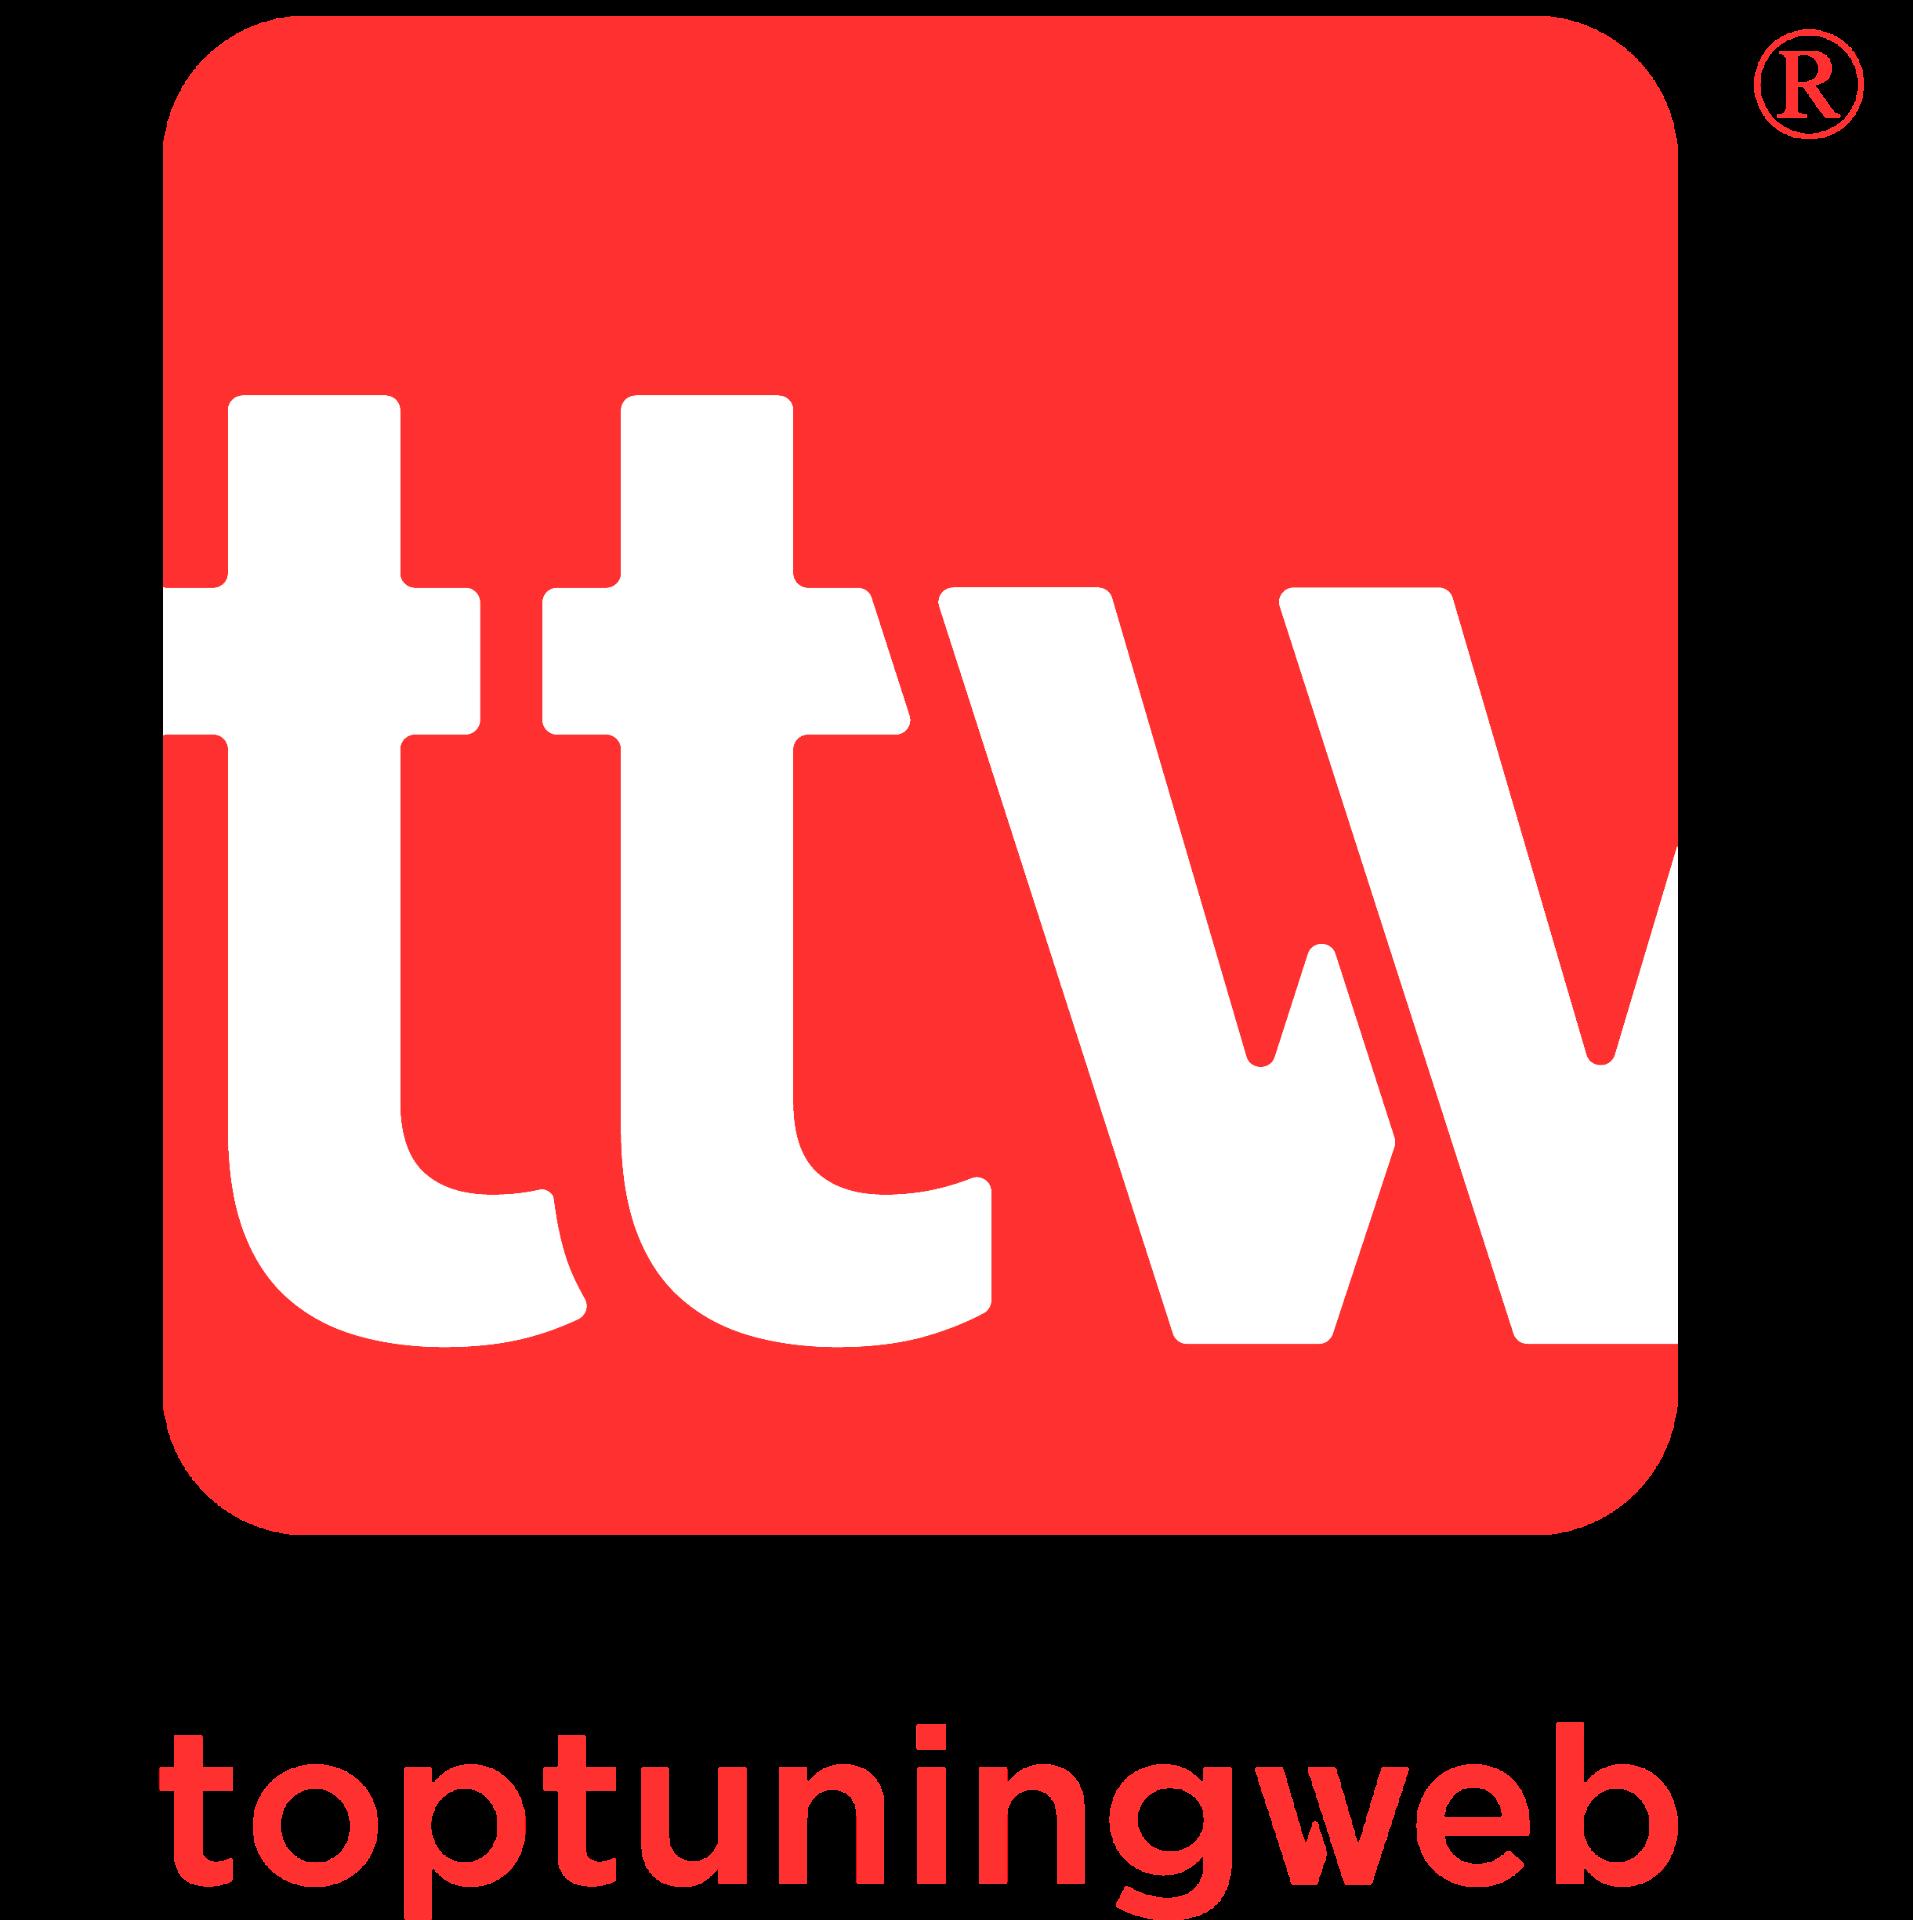 Toptuningweb